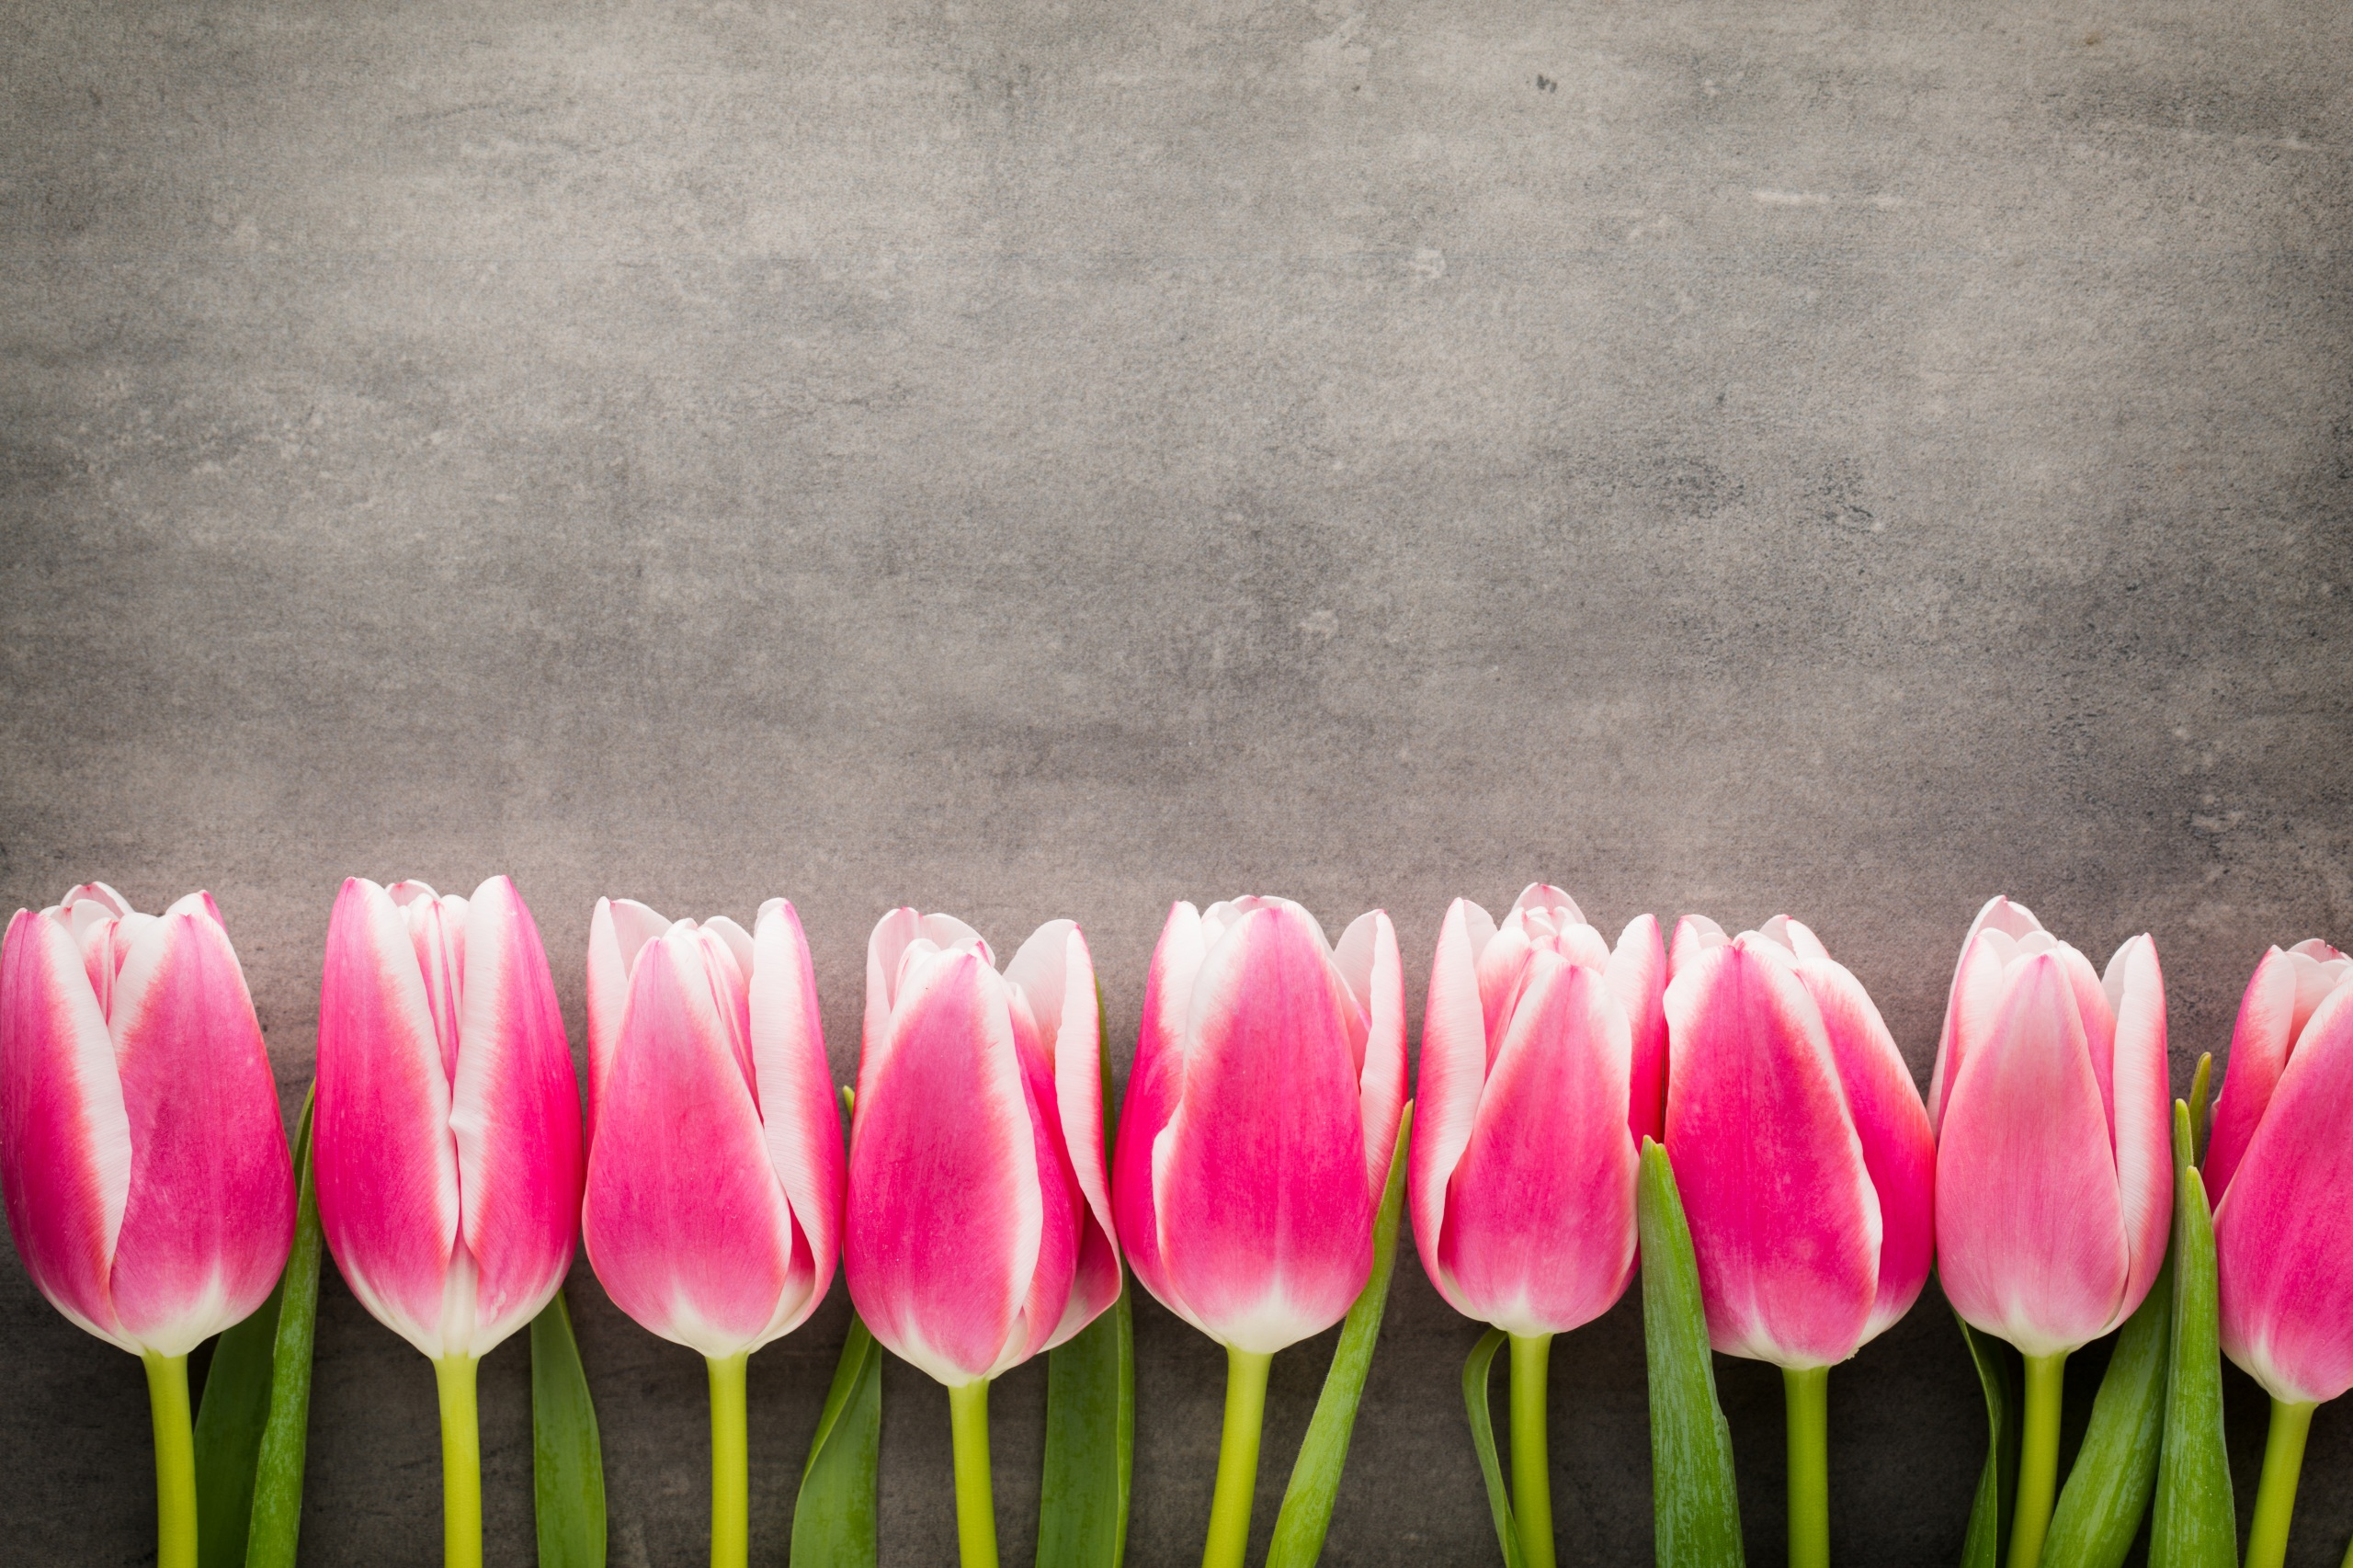 Картинка розовая Тюльпаны цветок 2560x1706 розовых розовые Розовый тюльпан Цветы